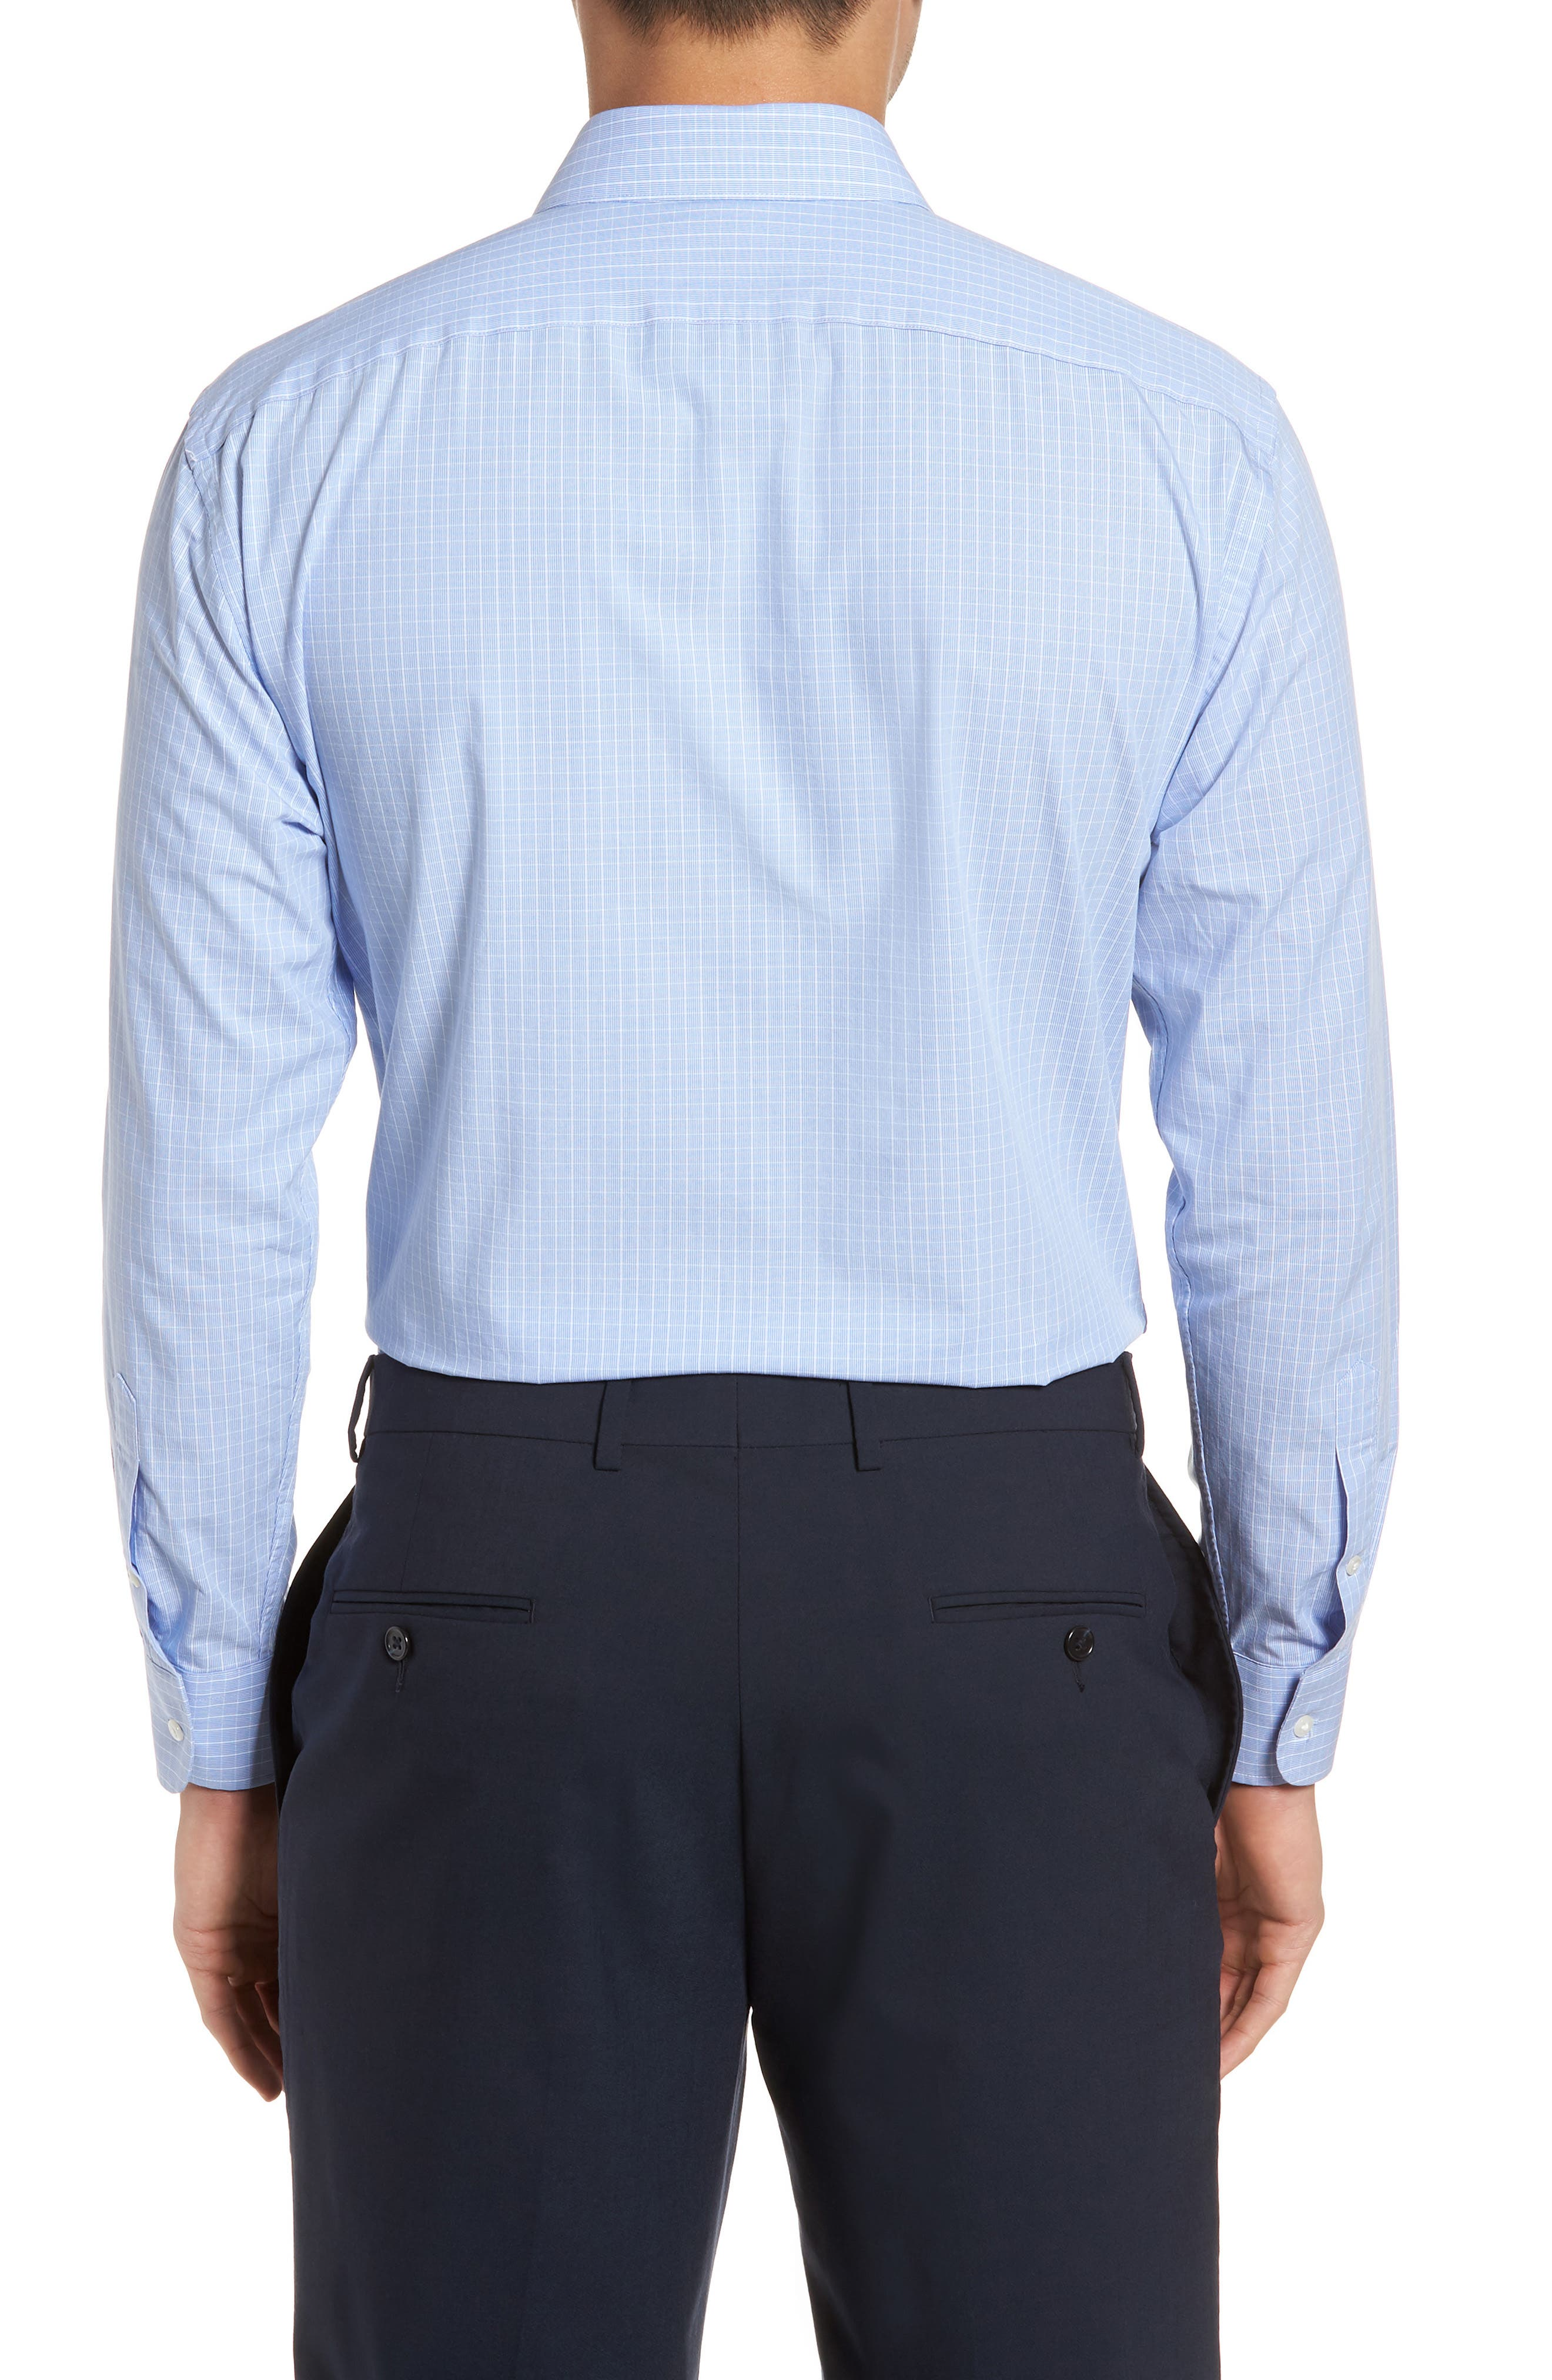 Alternate Image 2  - Nordstrom Men's Shop Tech-Smart Trim Fit Grid Dress Shirt